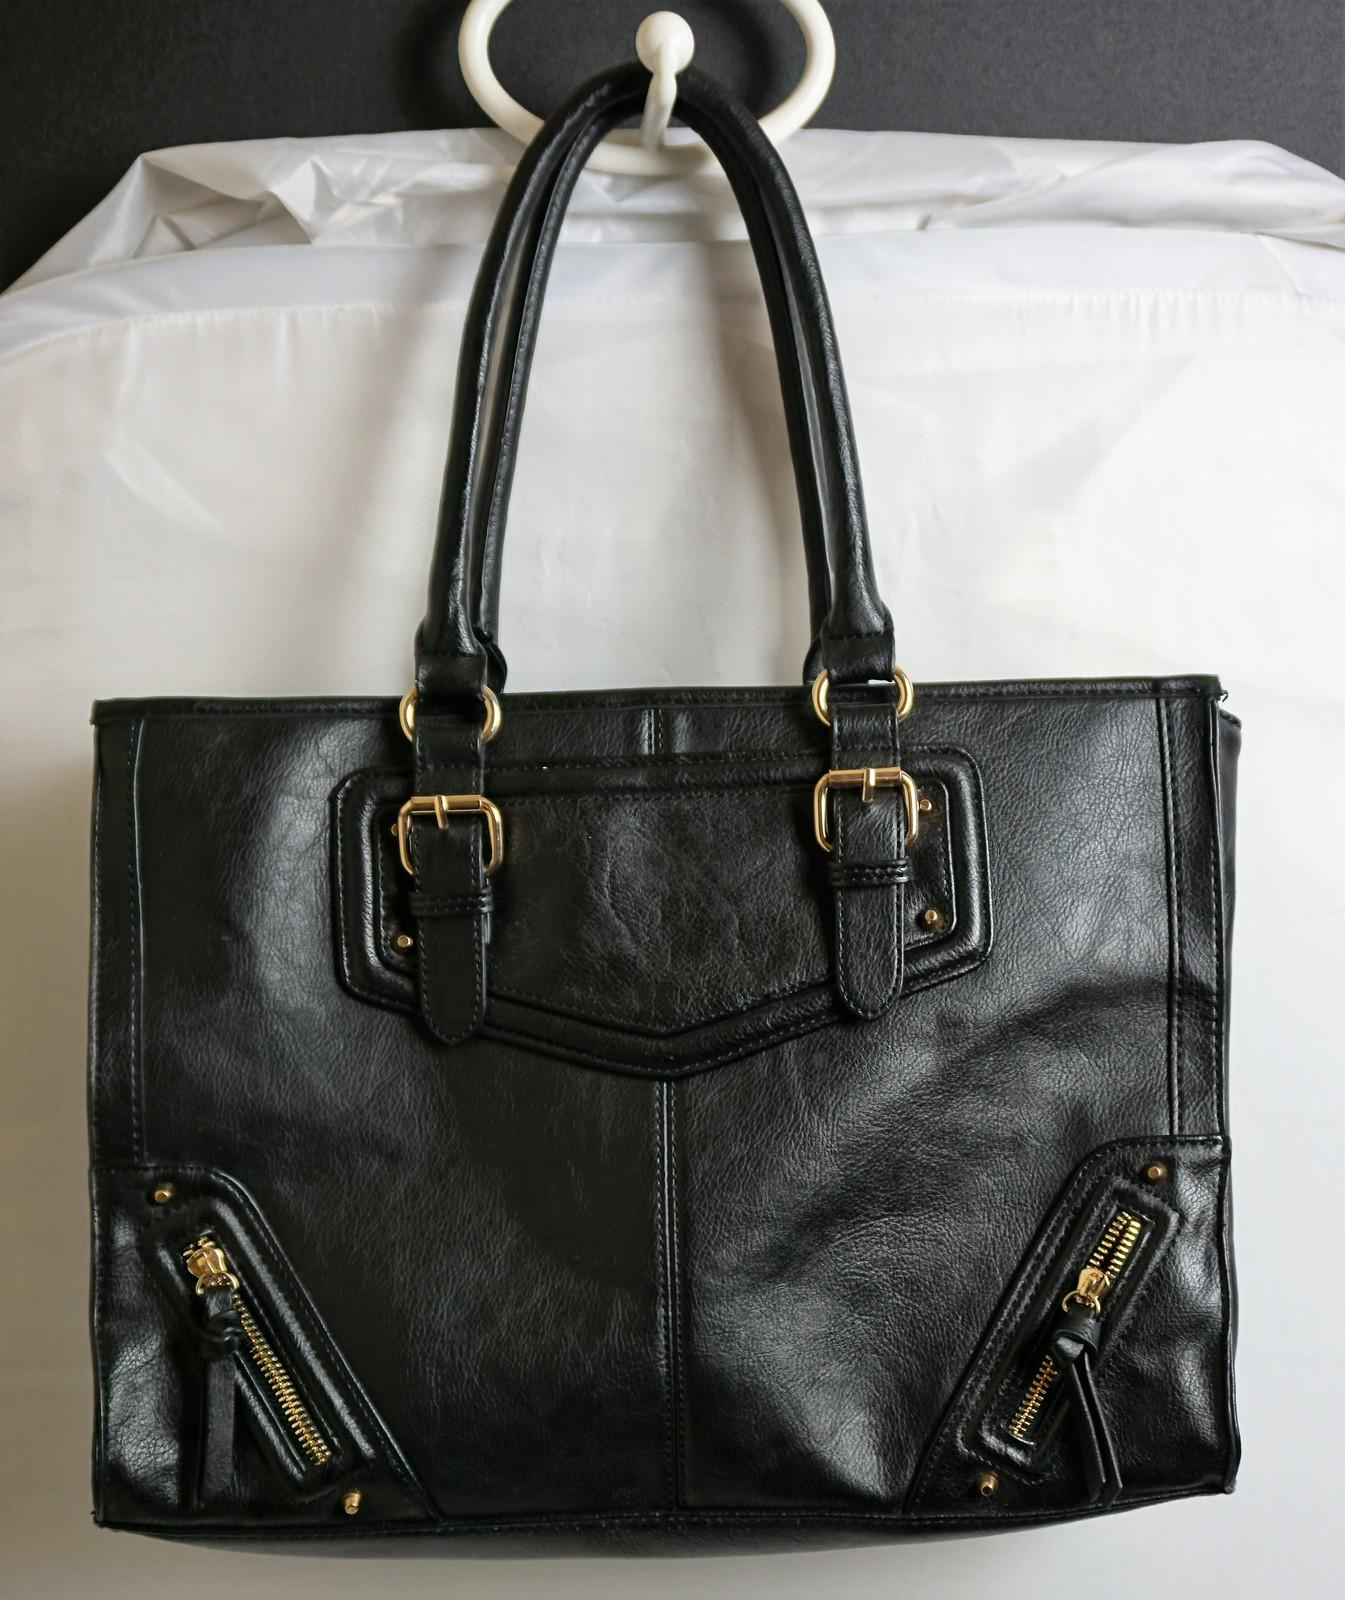 cd23fcacf6b1b Aldo Beautiful Black Large Faux Leather Purse Tote Shopper -  19.61